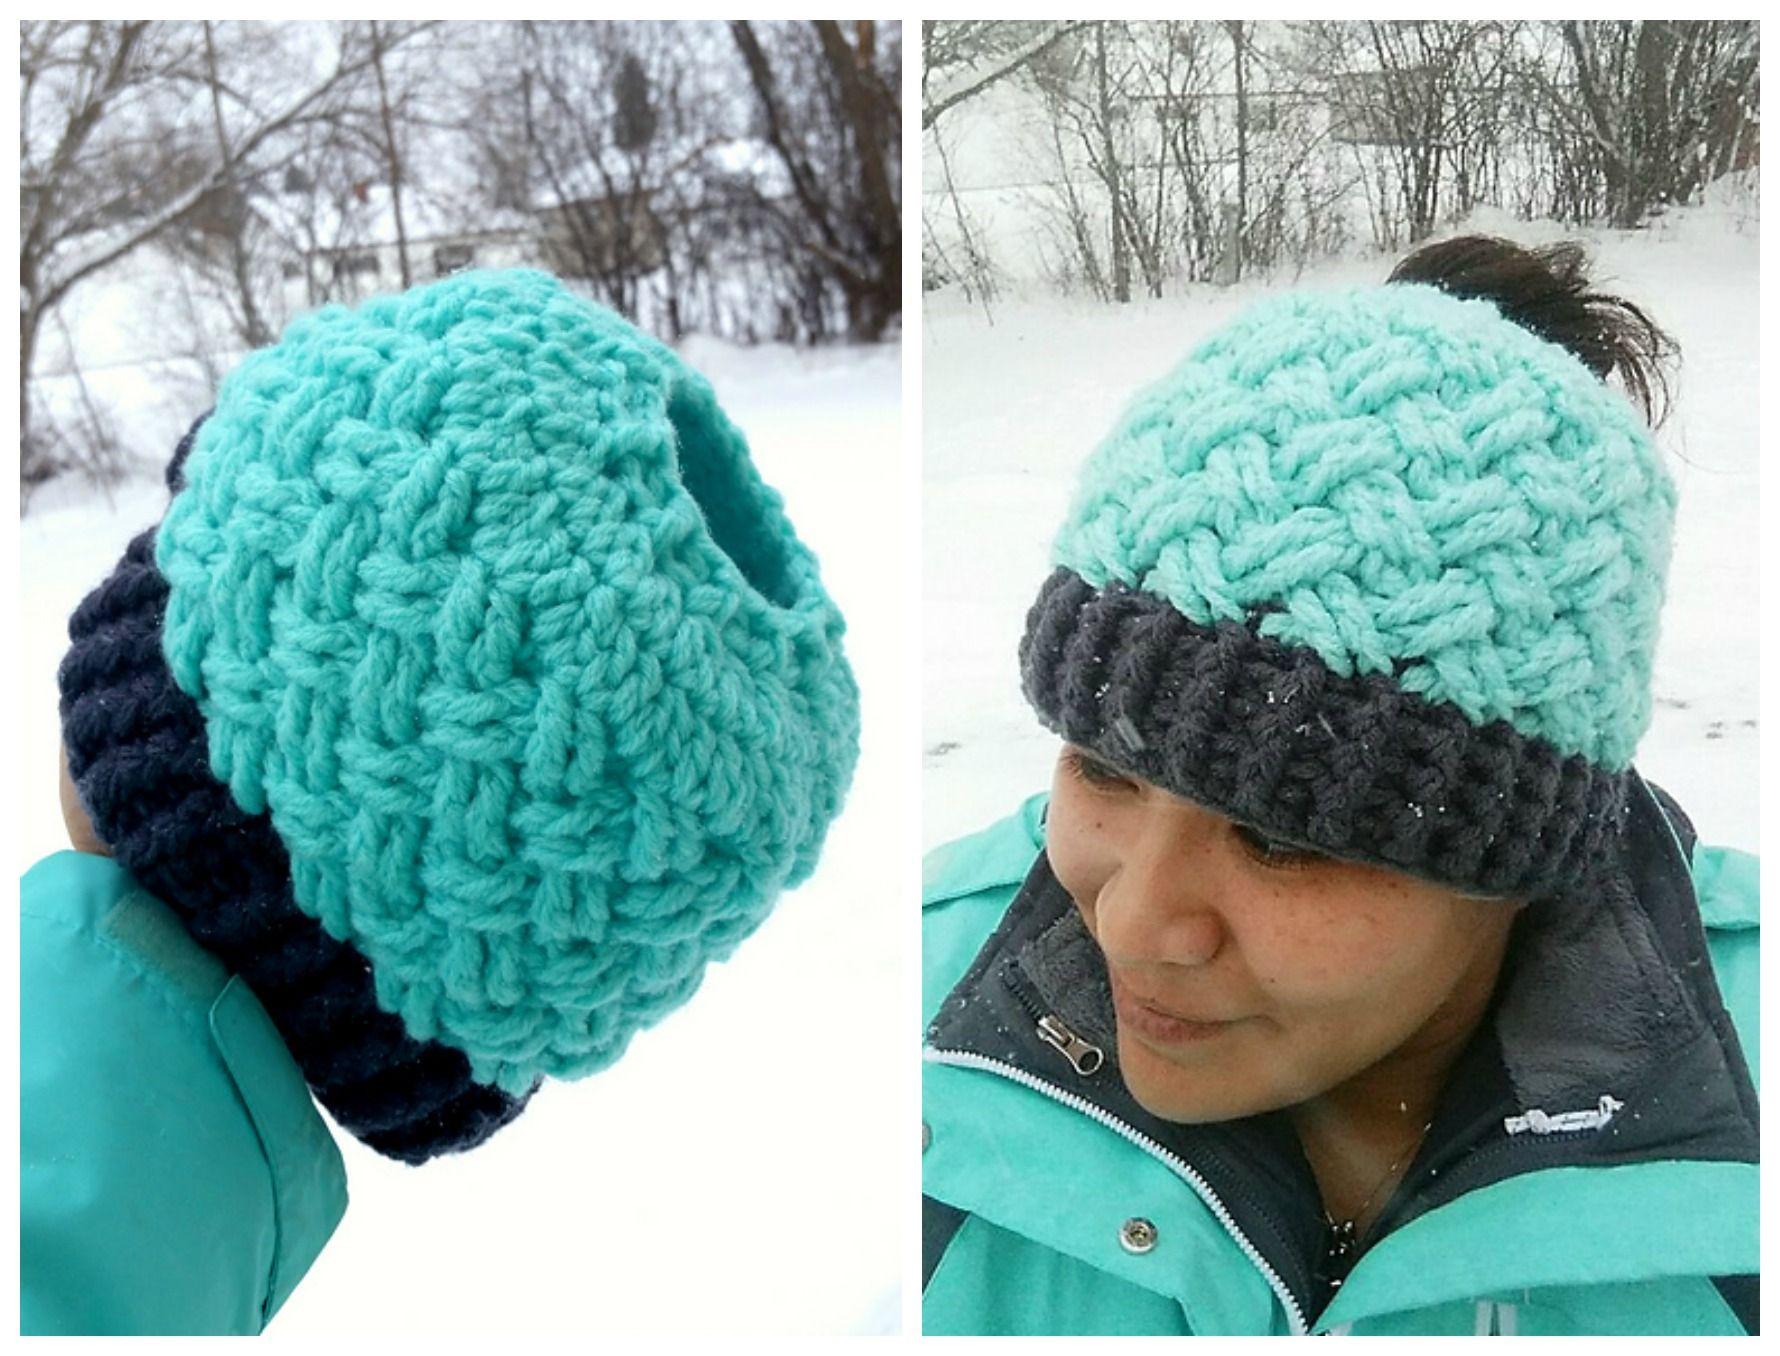 Celtic Weave Messy Bun hat | Crafts, Knit & Crochet | Pinterest ...